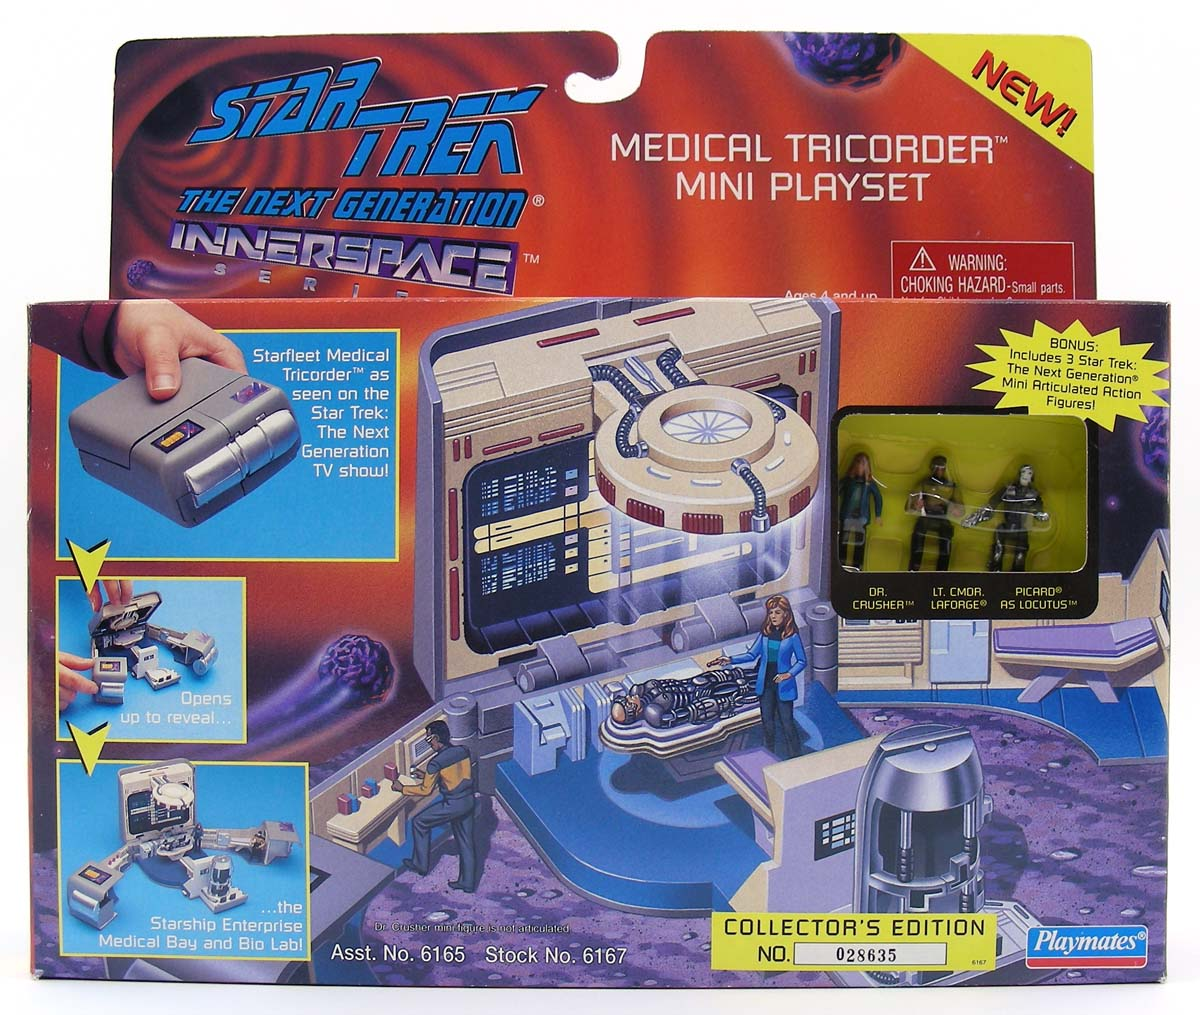 Mini playsets vaisseaux et figurines. Star_Trek_The_Next_Generation_Innerspace_Medical_Tricorder